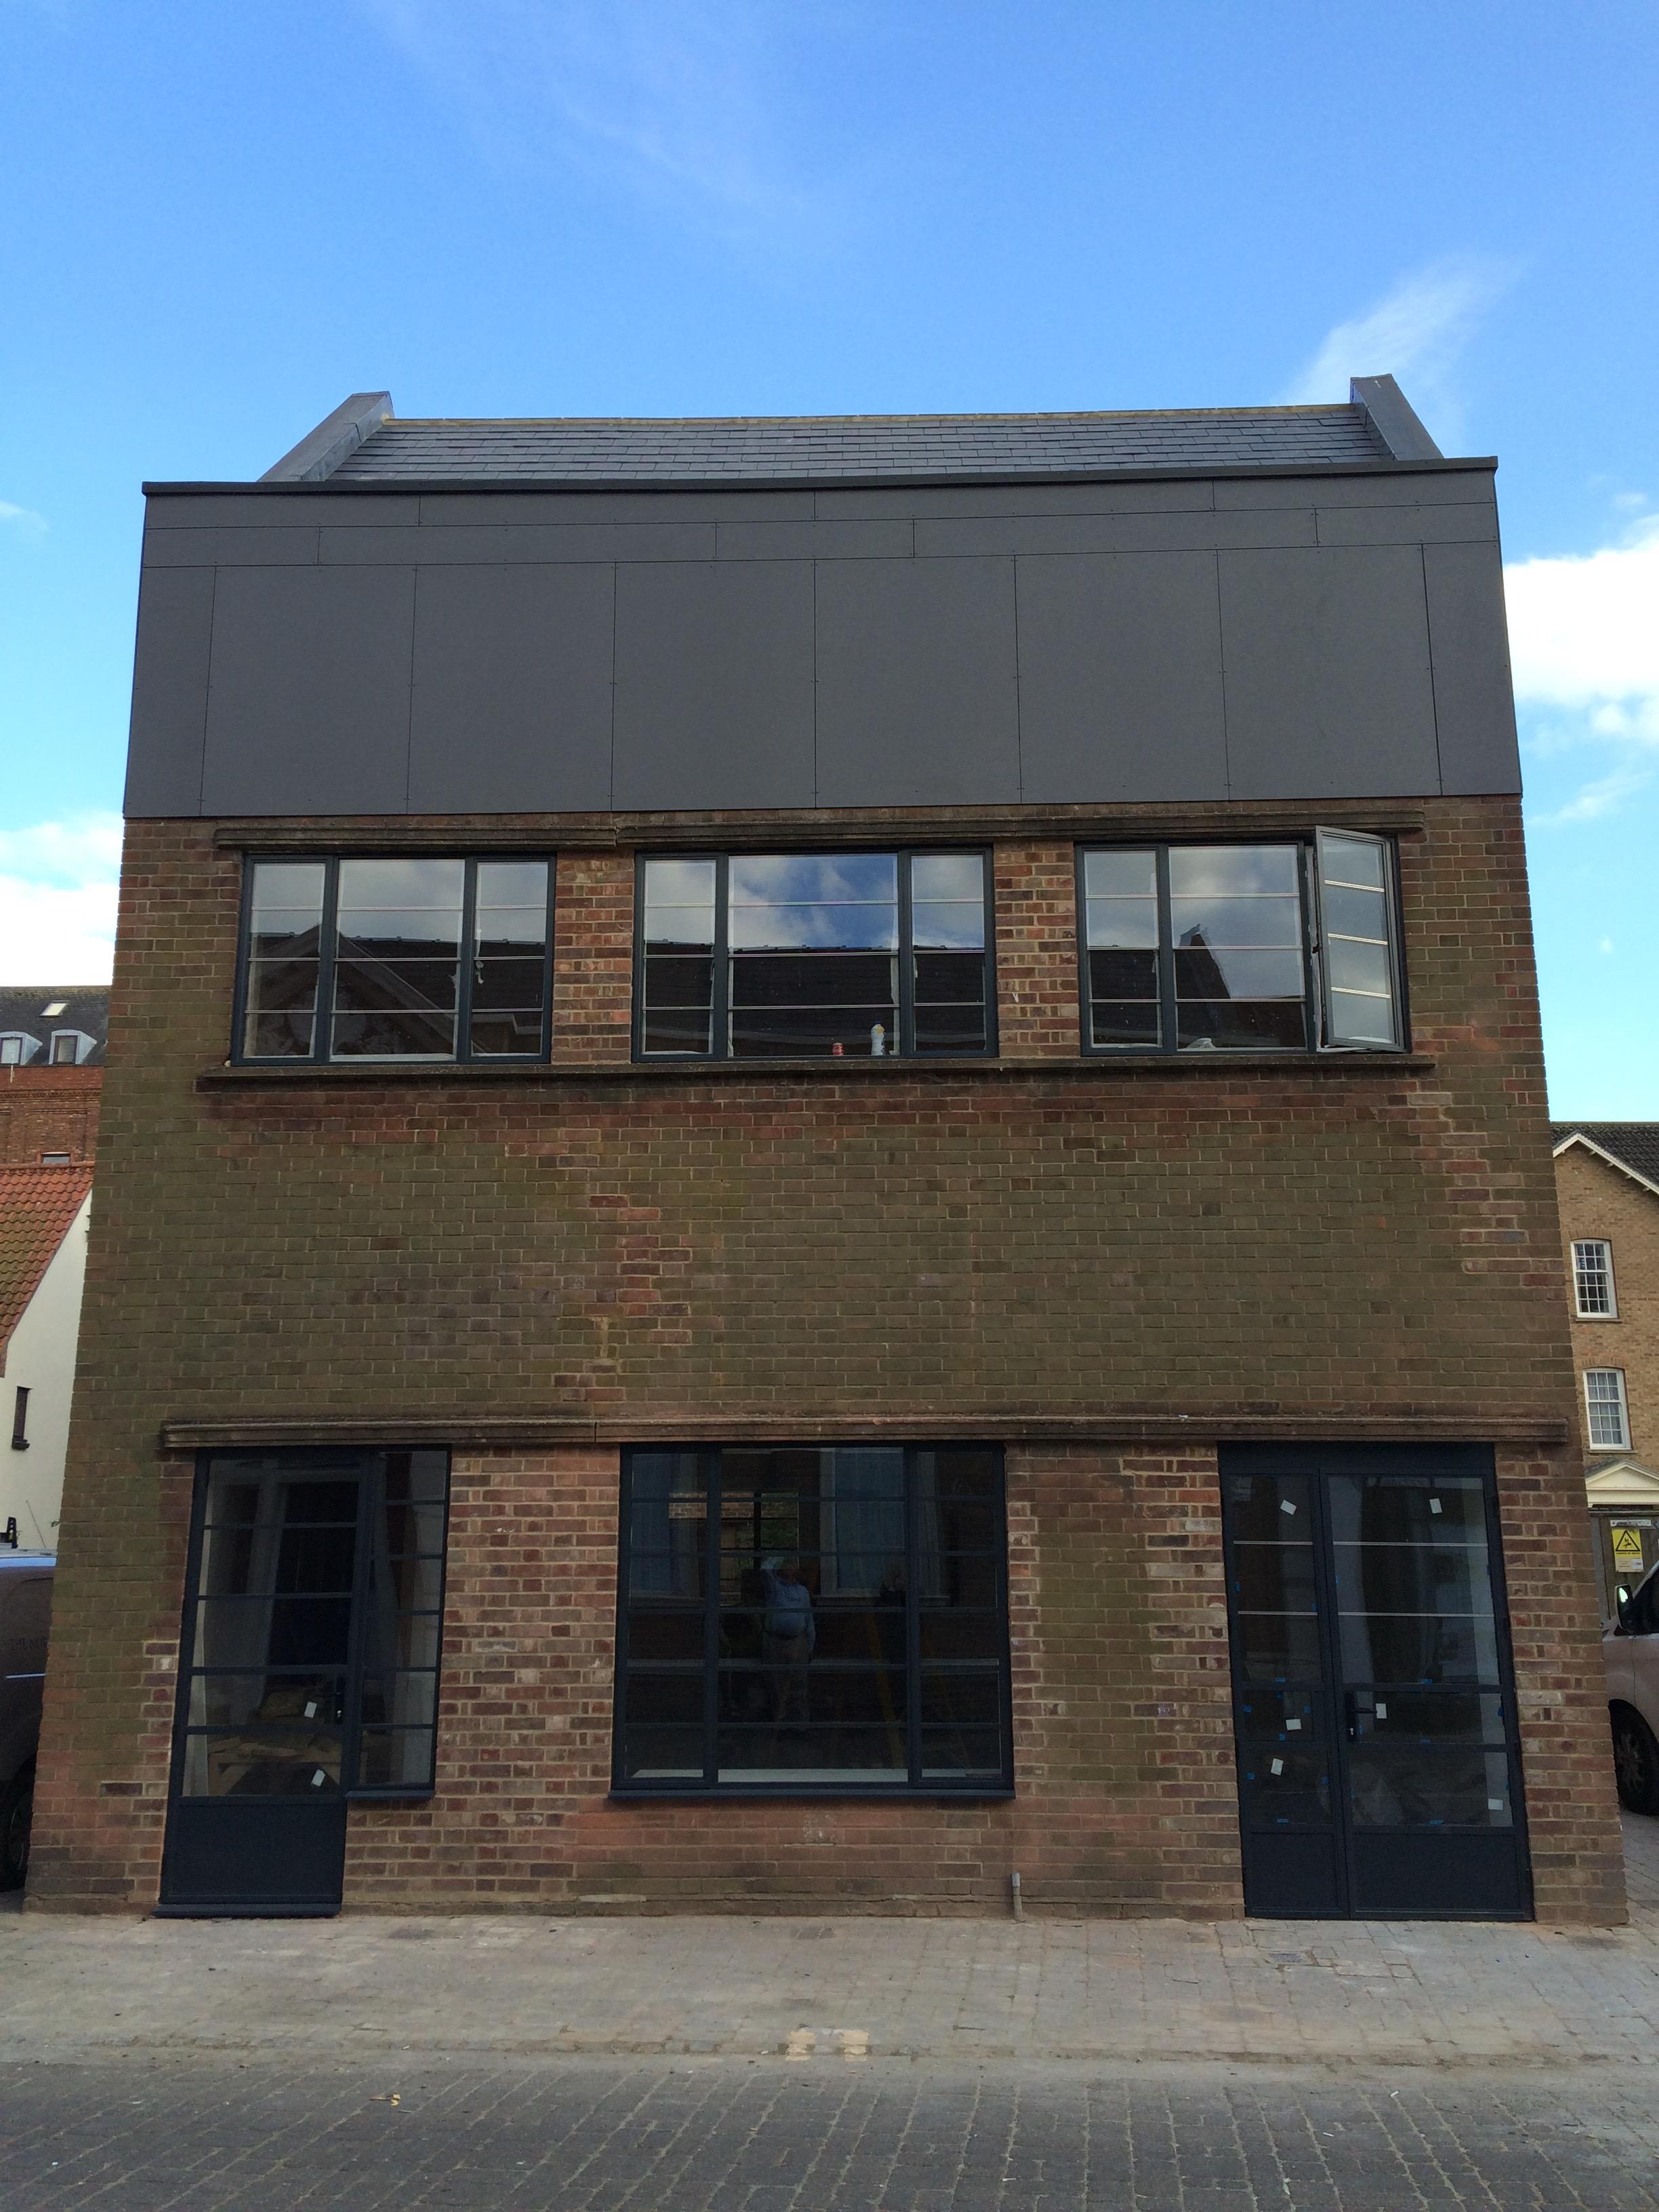 GroundWork gallery facade